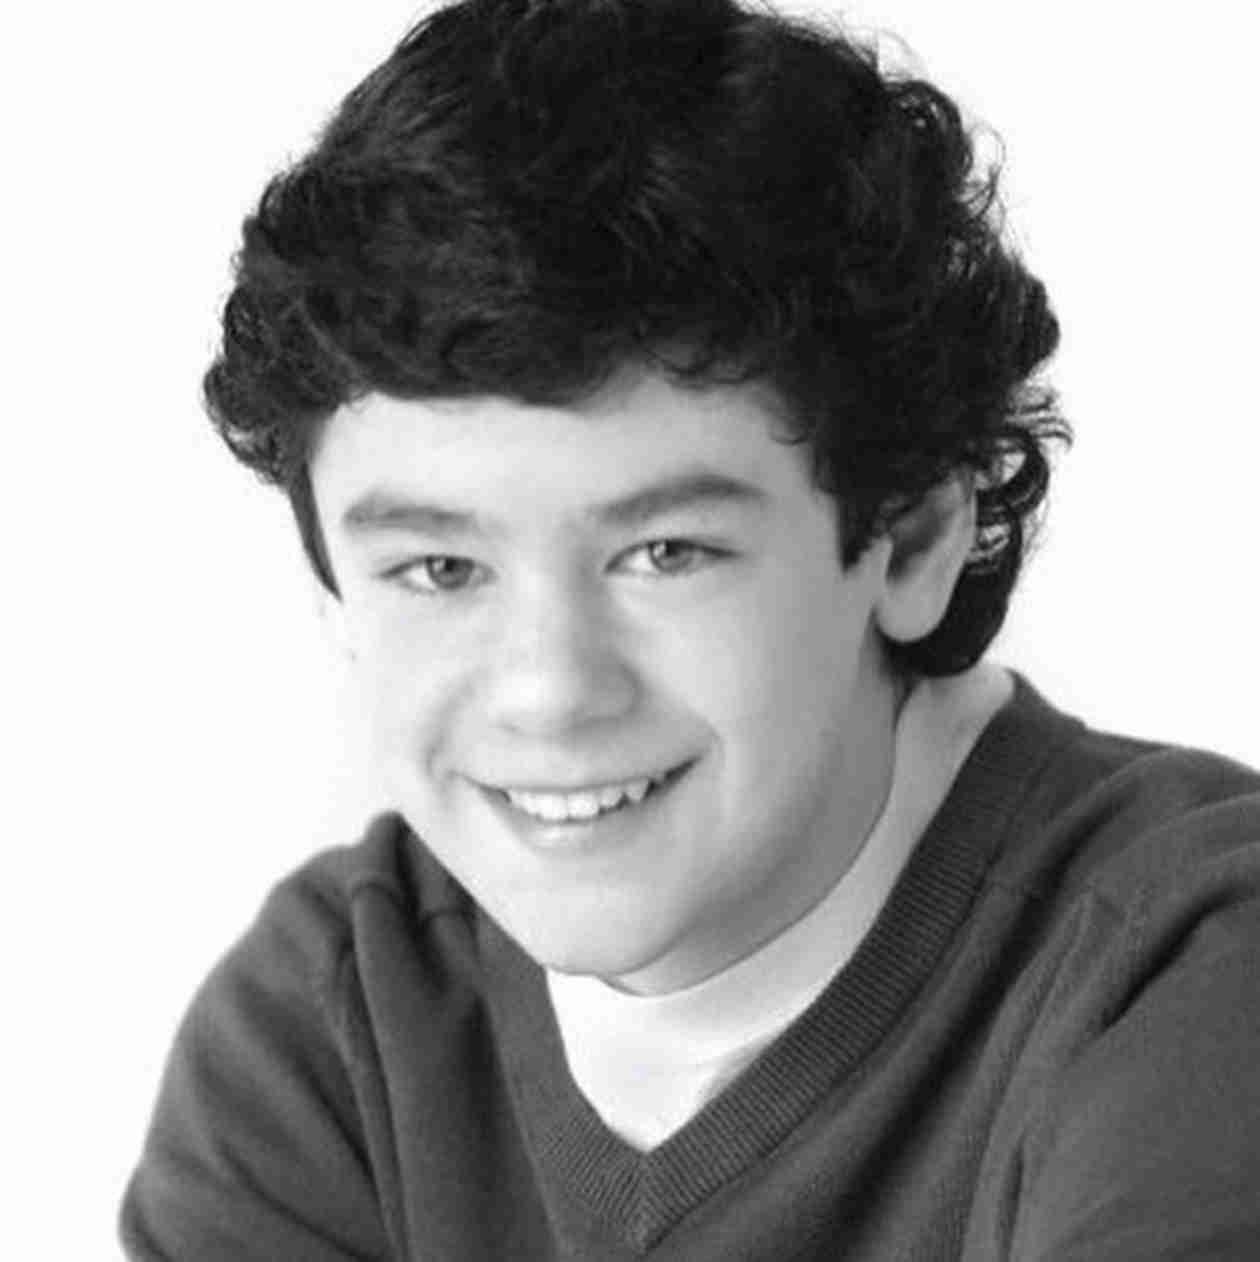 Brendan Robinson at 12 Years Old: Adorable Photo!